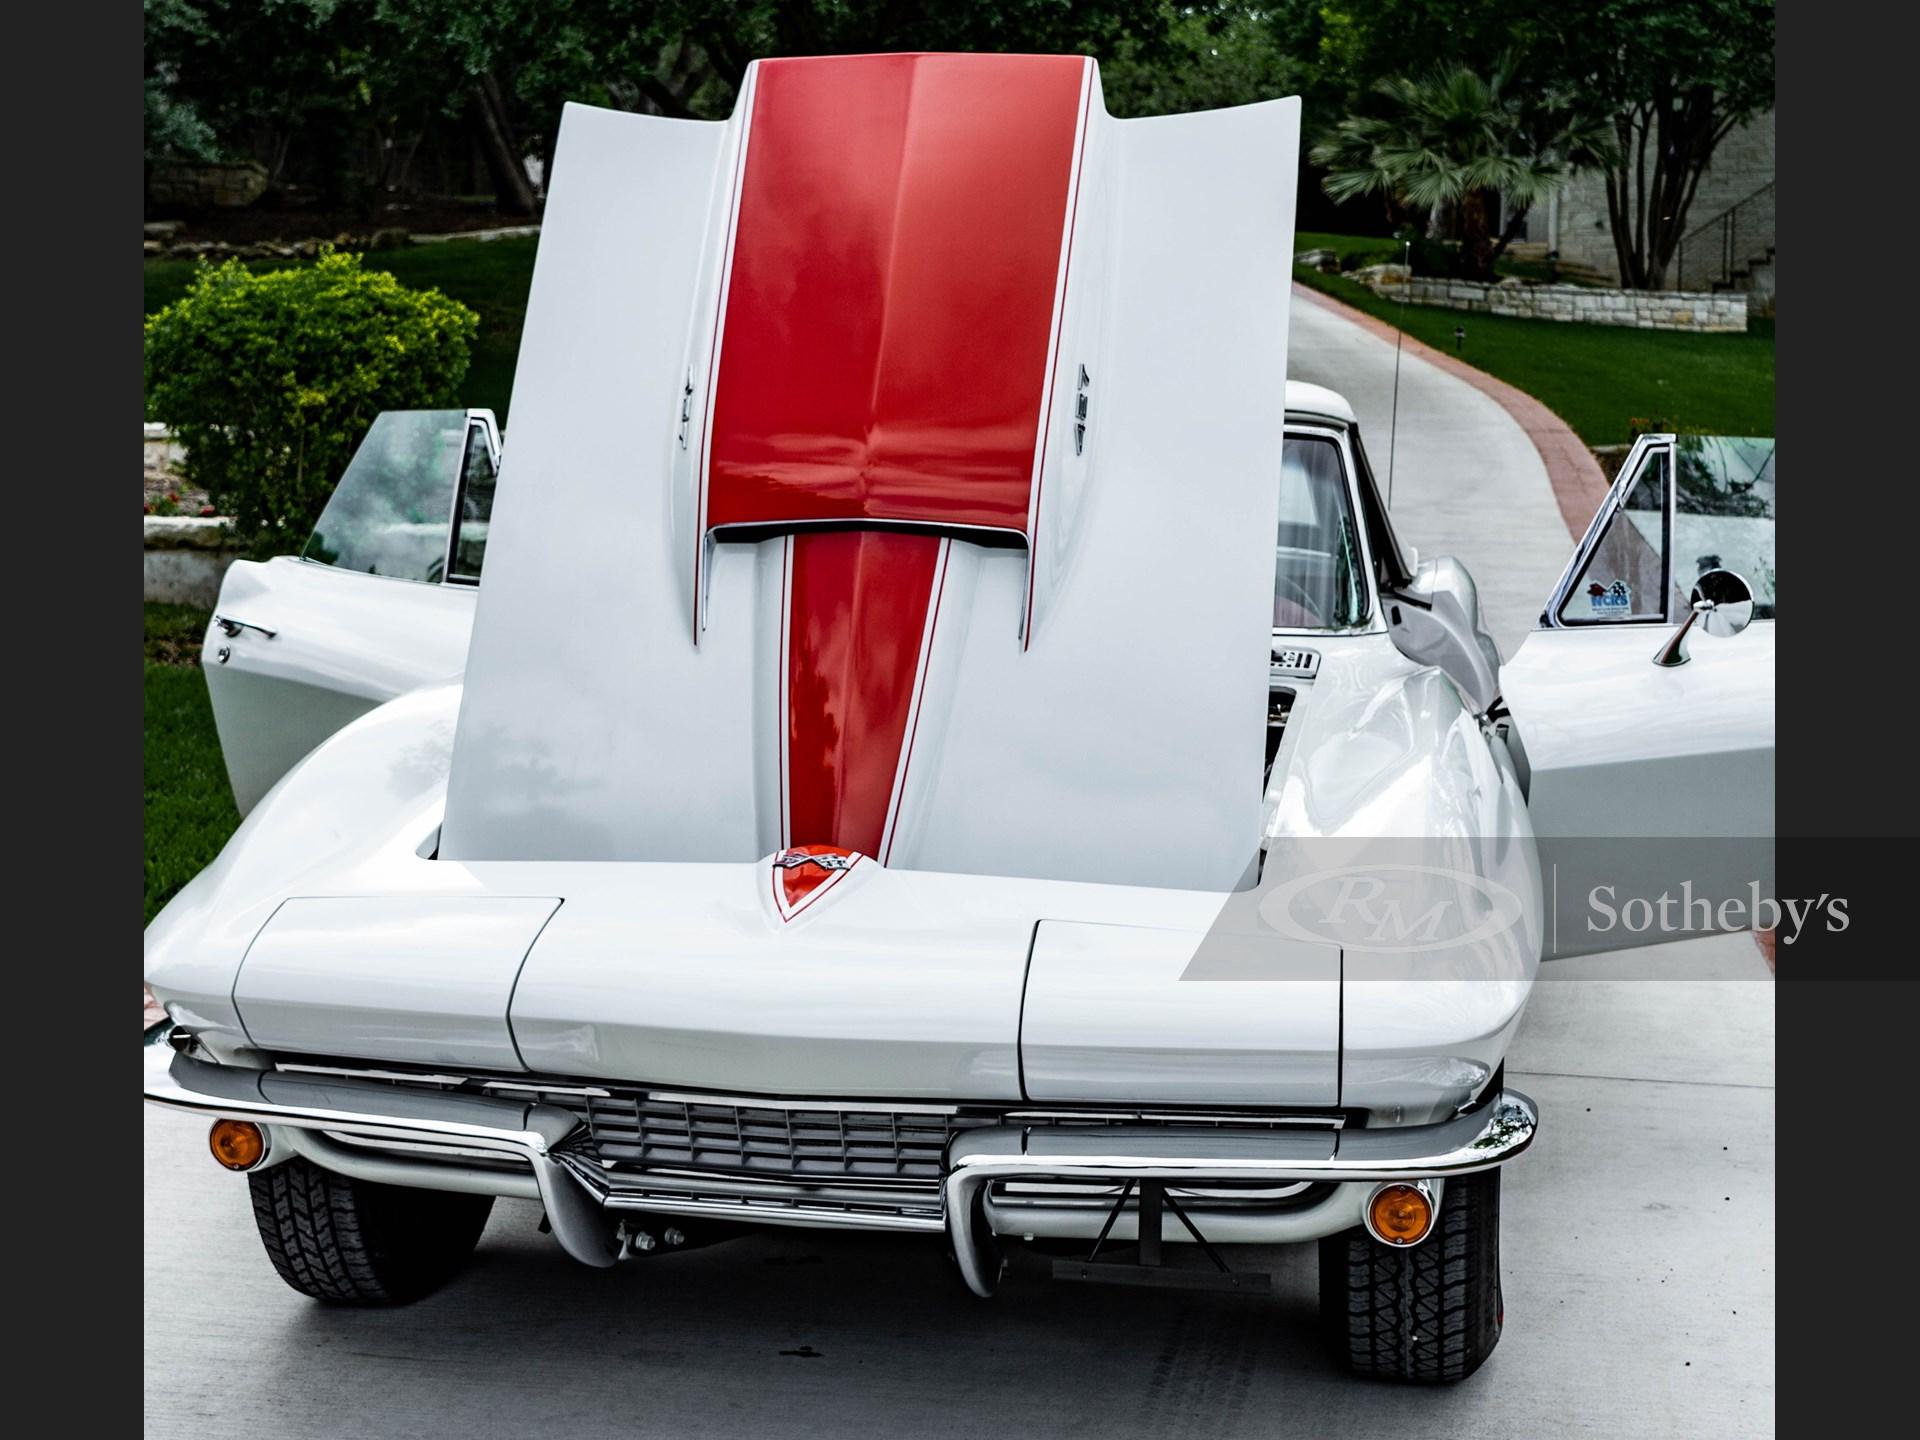 1967 Chevrolet Corvette Sting Ray 427/390 Convertible  -